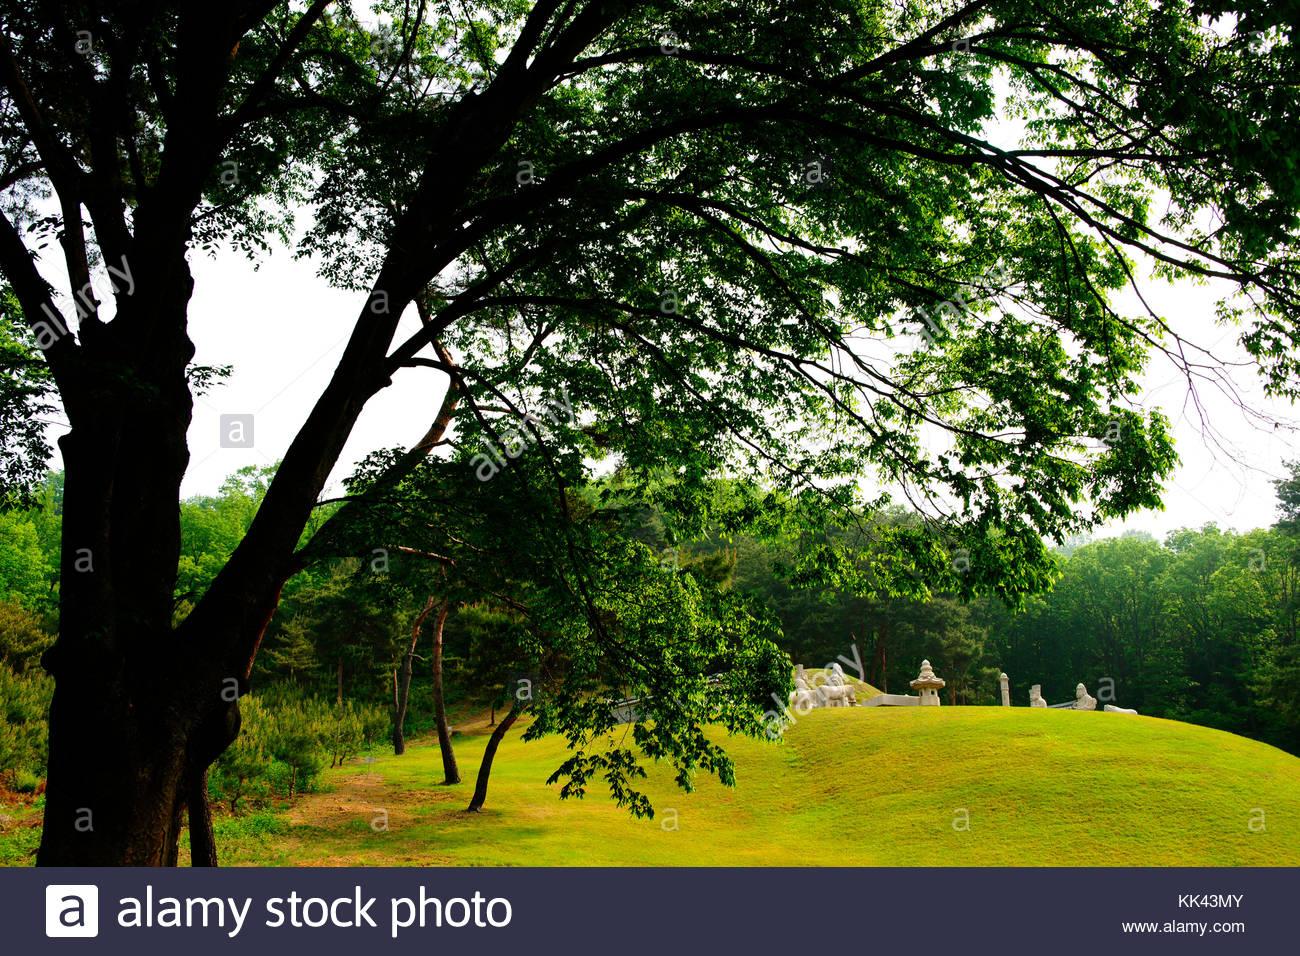 Korean history Royal Tombs of the Joseon Dynasty King Sukjong Queen Ingyeong zelkova tree - Stock Image